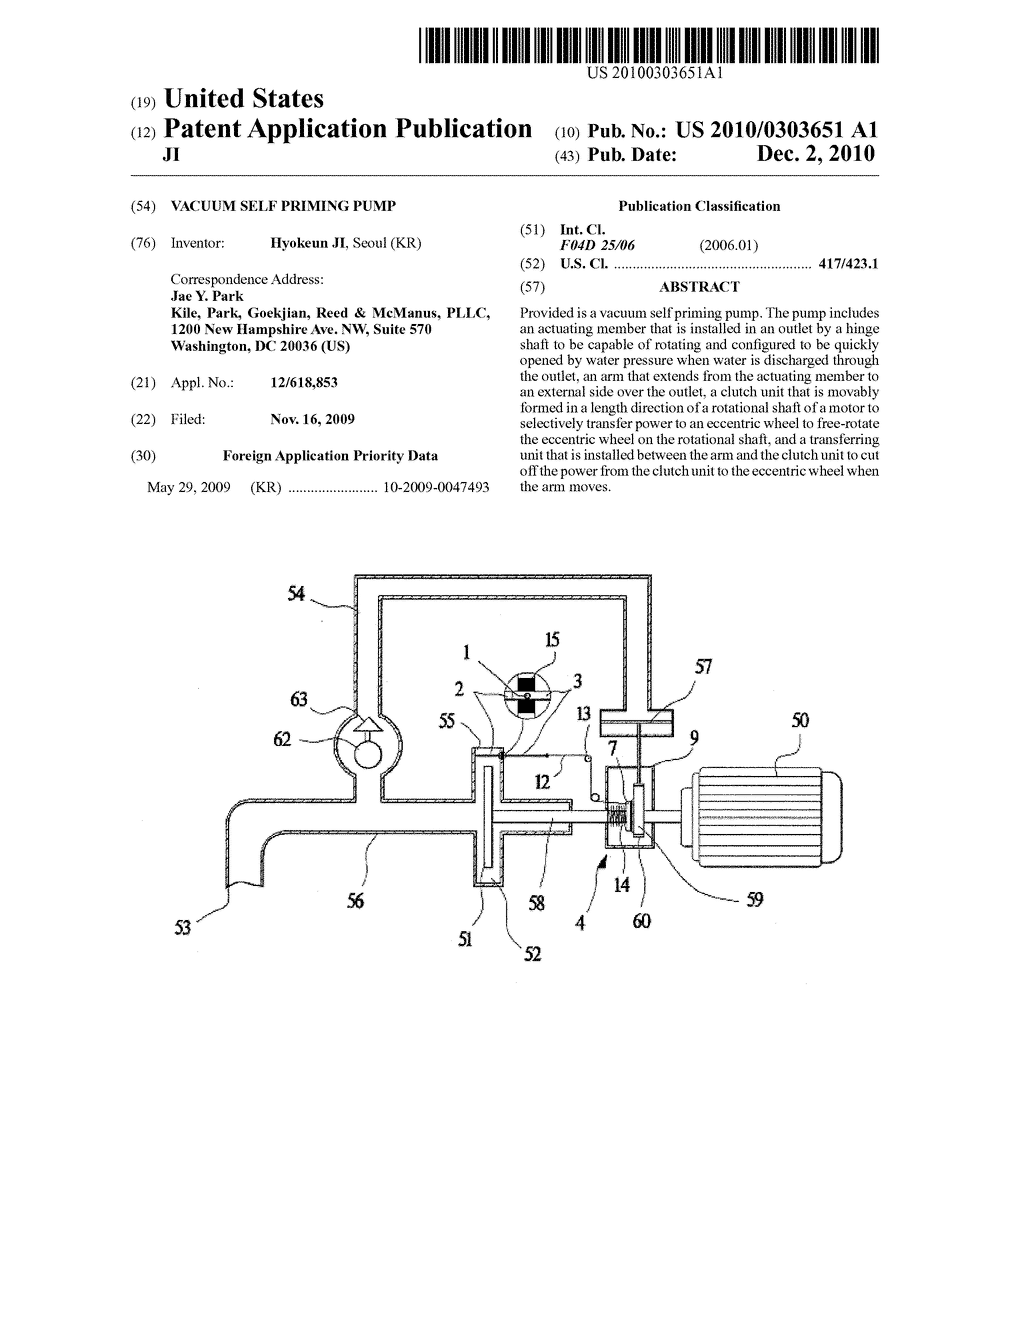 vacuum self priming pump diagram schematic and image 01 rh patentsencyclopedia com